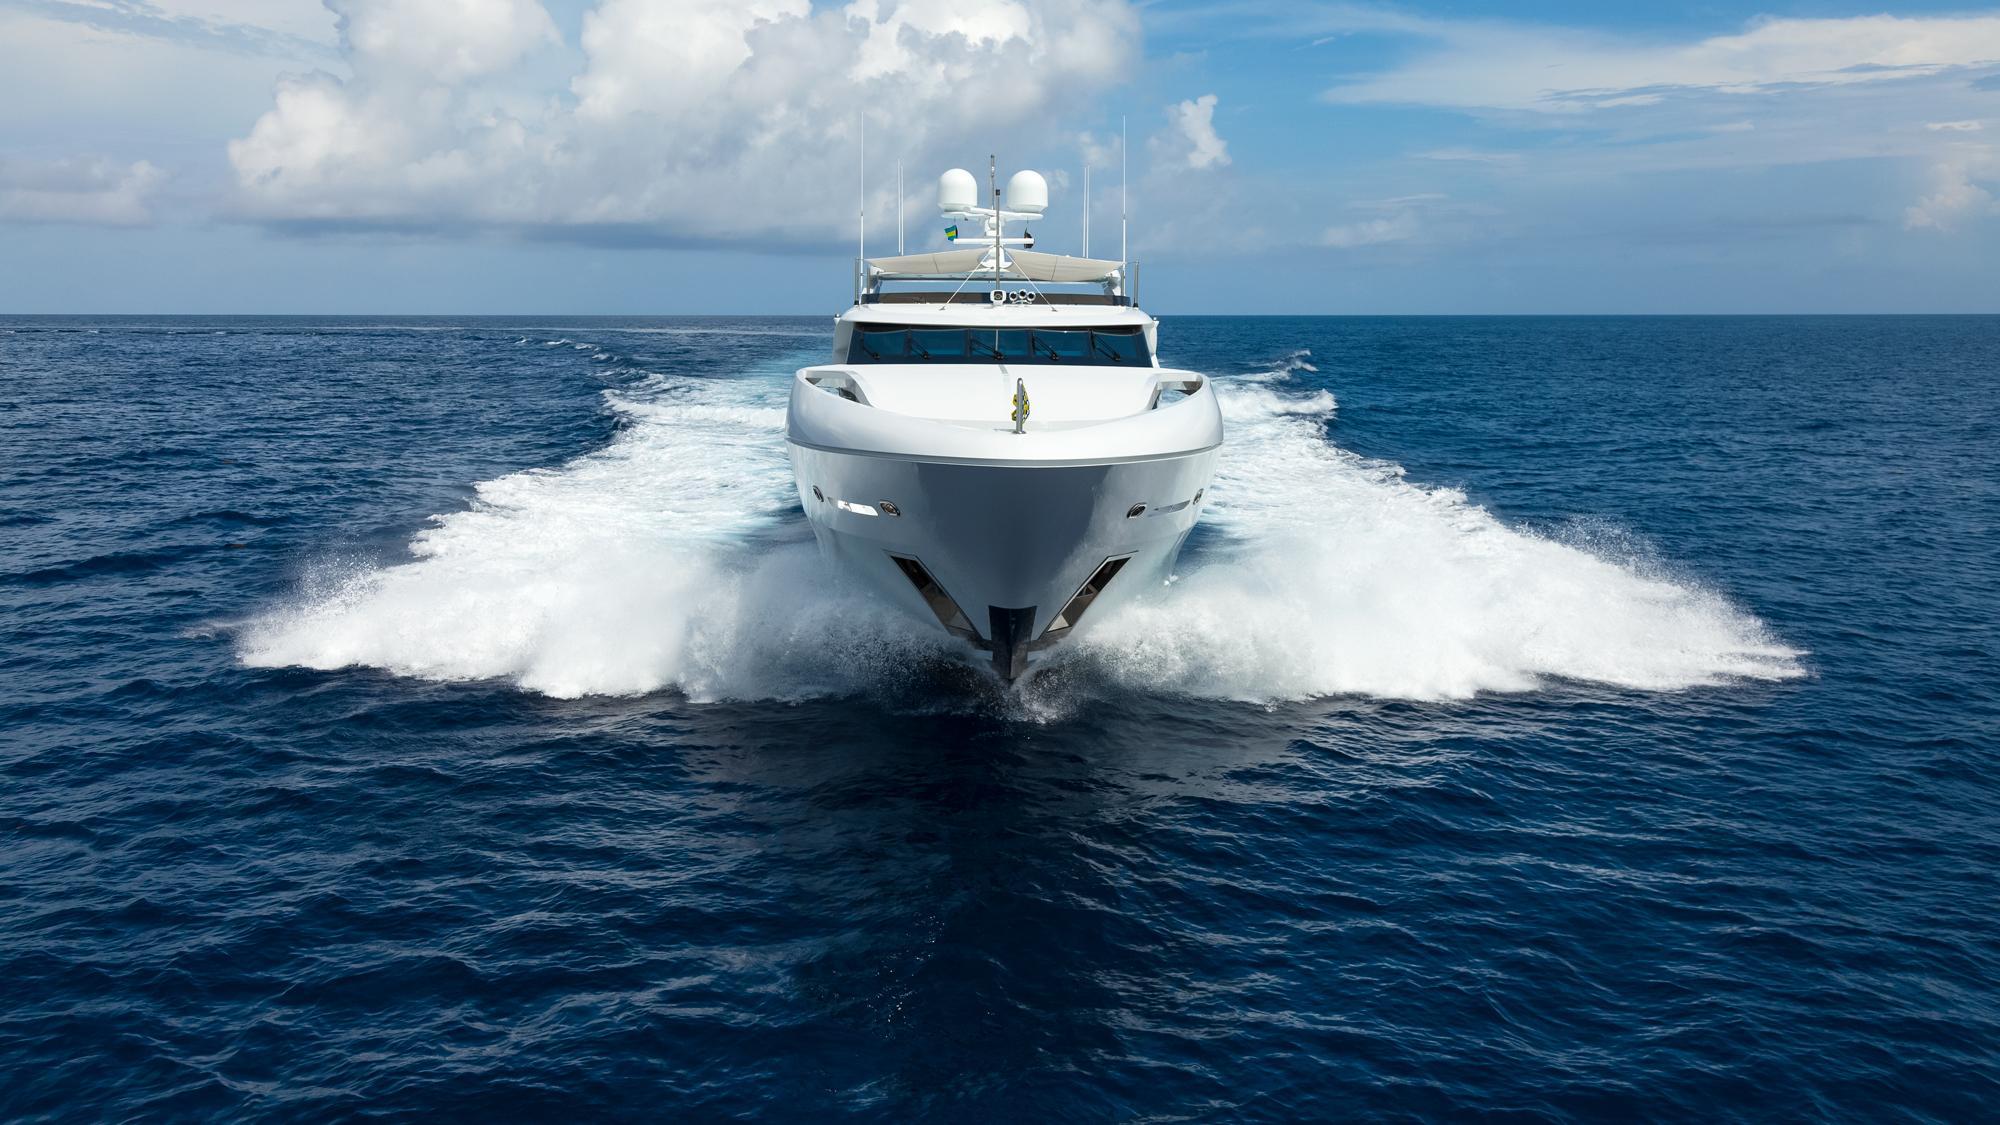 finish-line-motor-yacht-trinity-2013-37m-cruising-bow